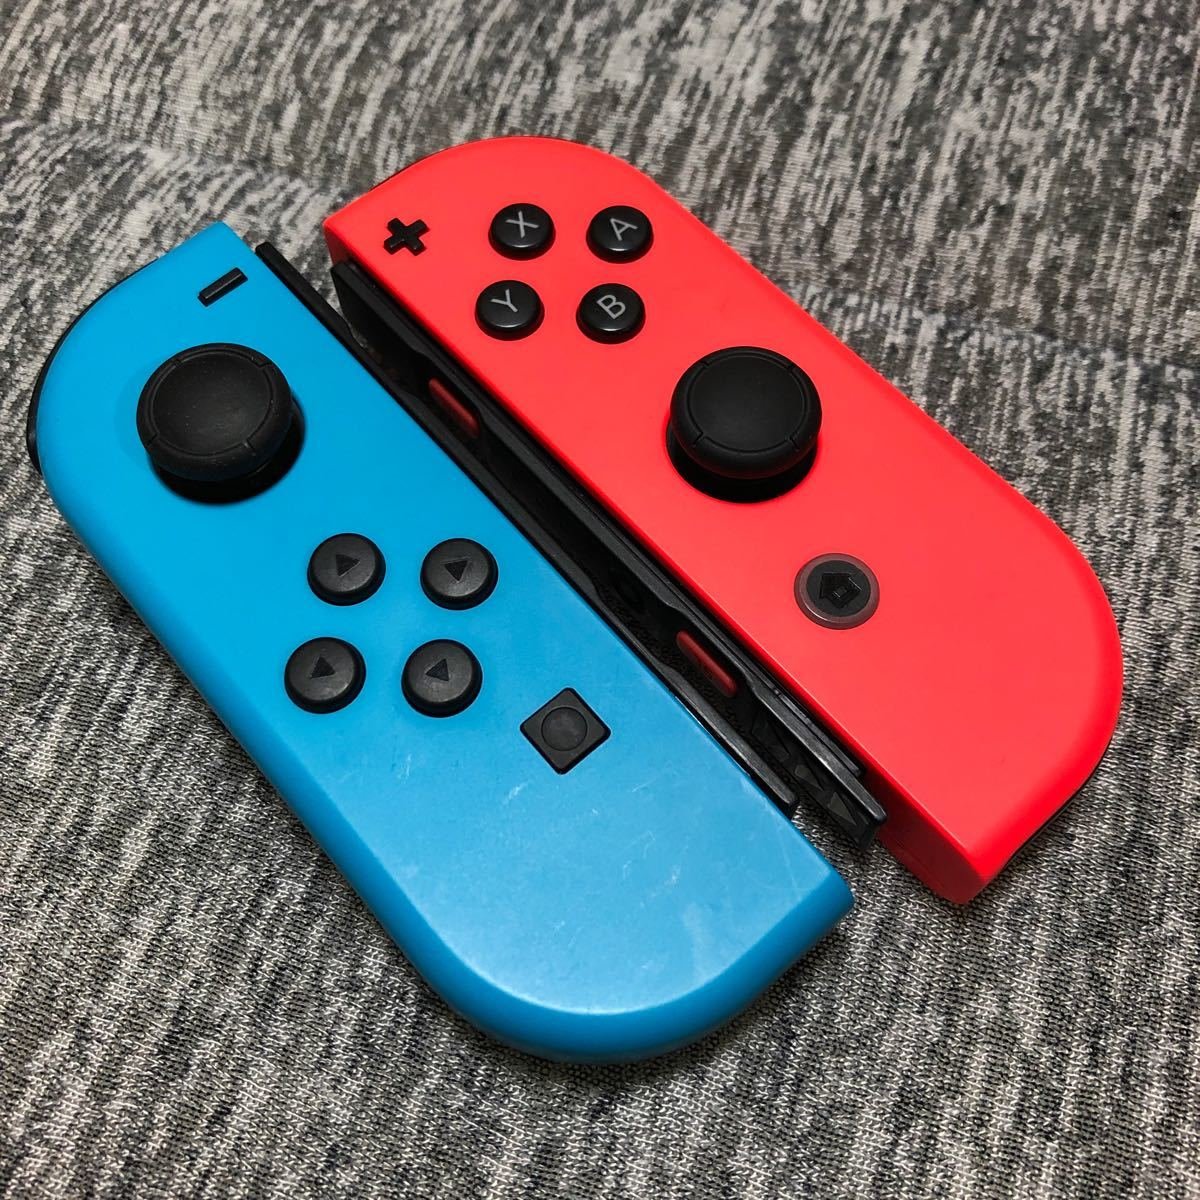 Nintendo Switch Joy-Con ジョイコン ニンテンドースイッチ ネオンレッド ネオンブルー 動作確認済み